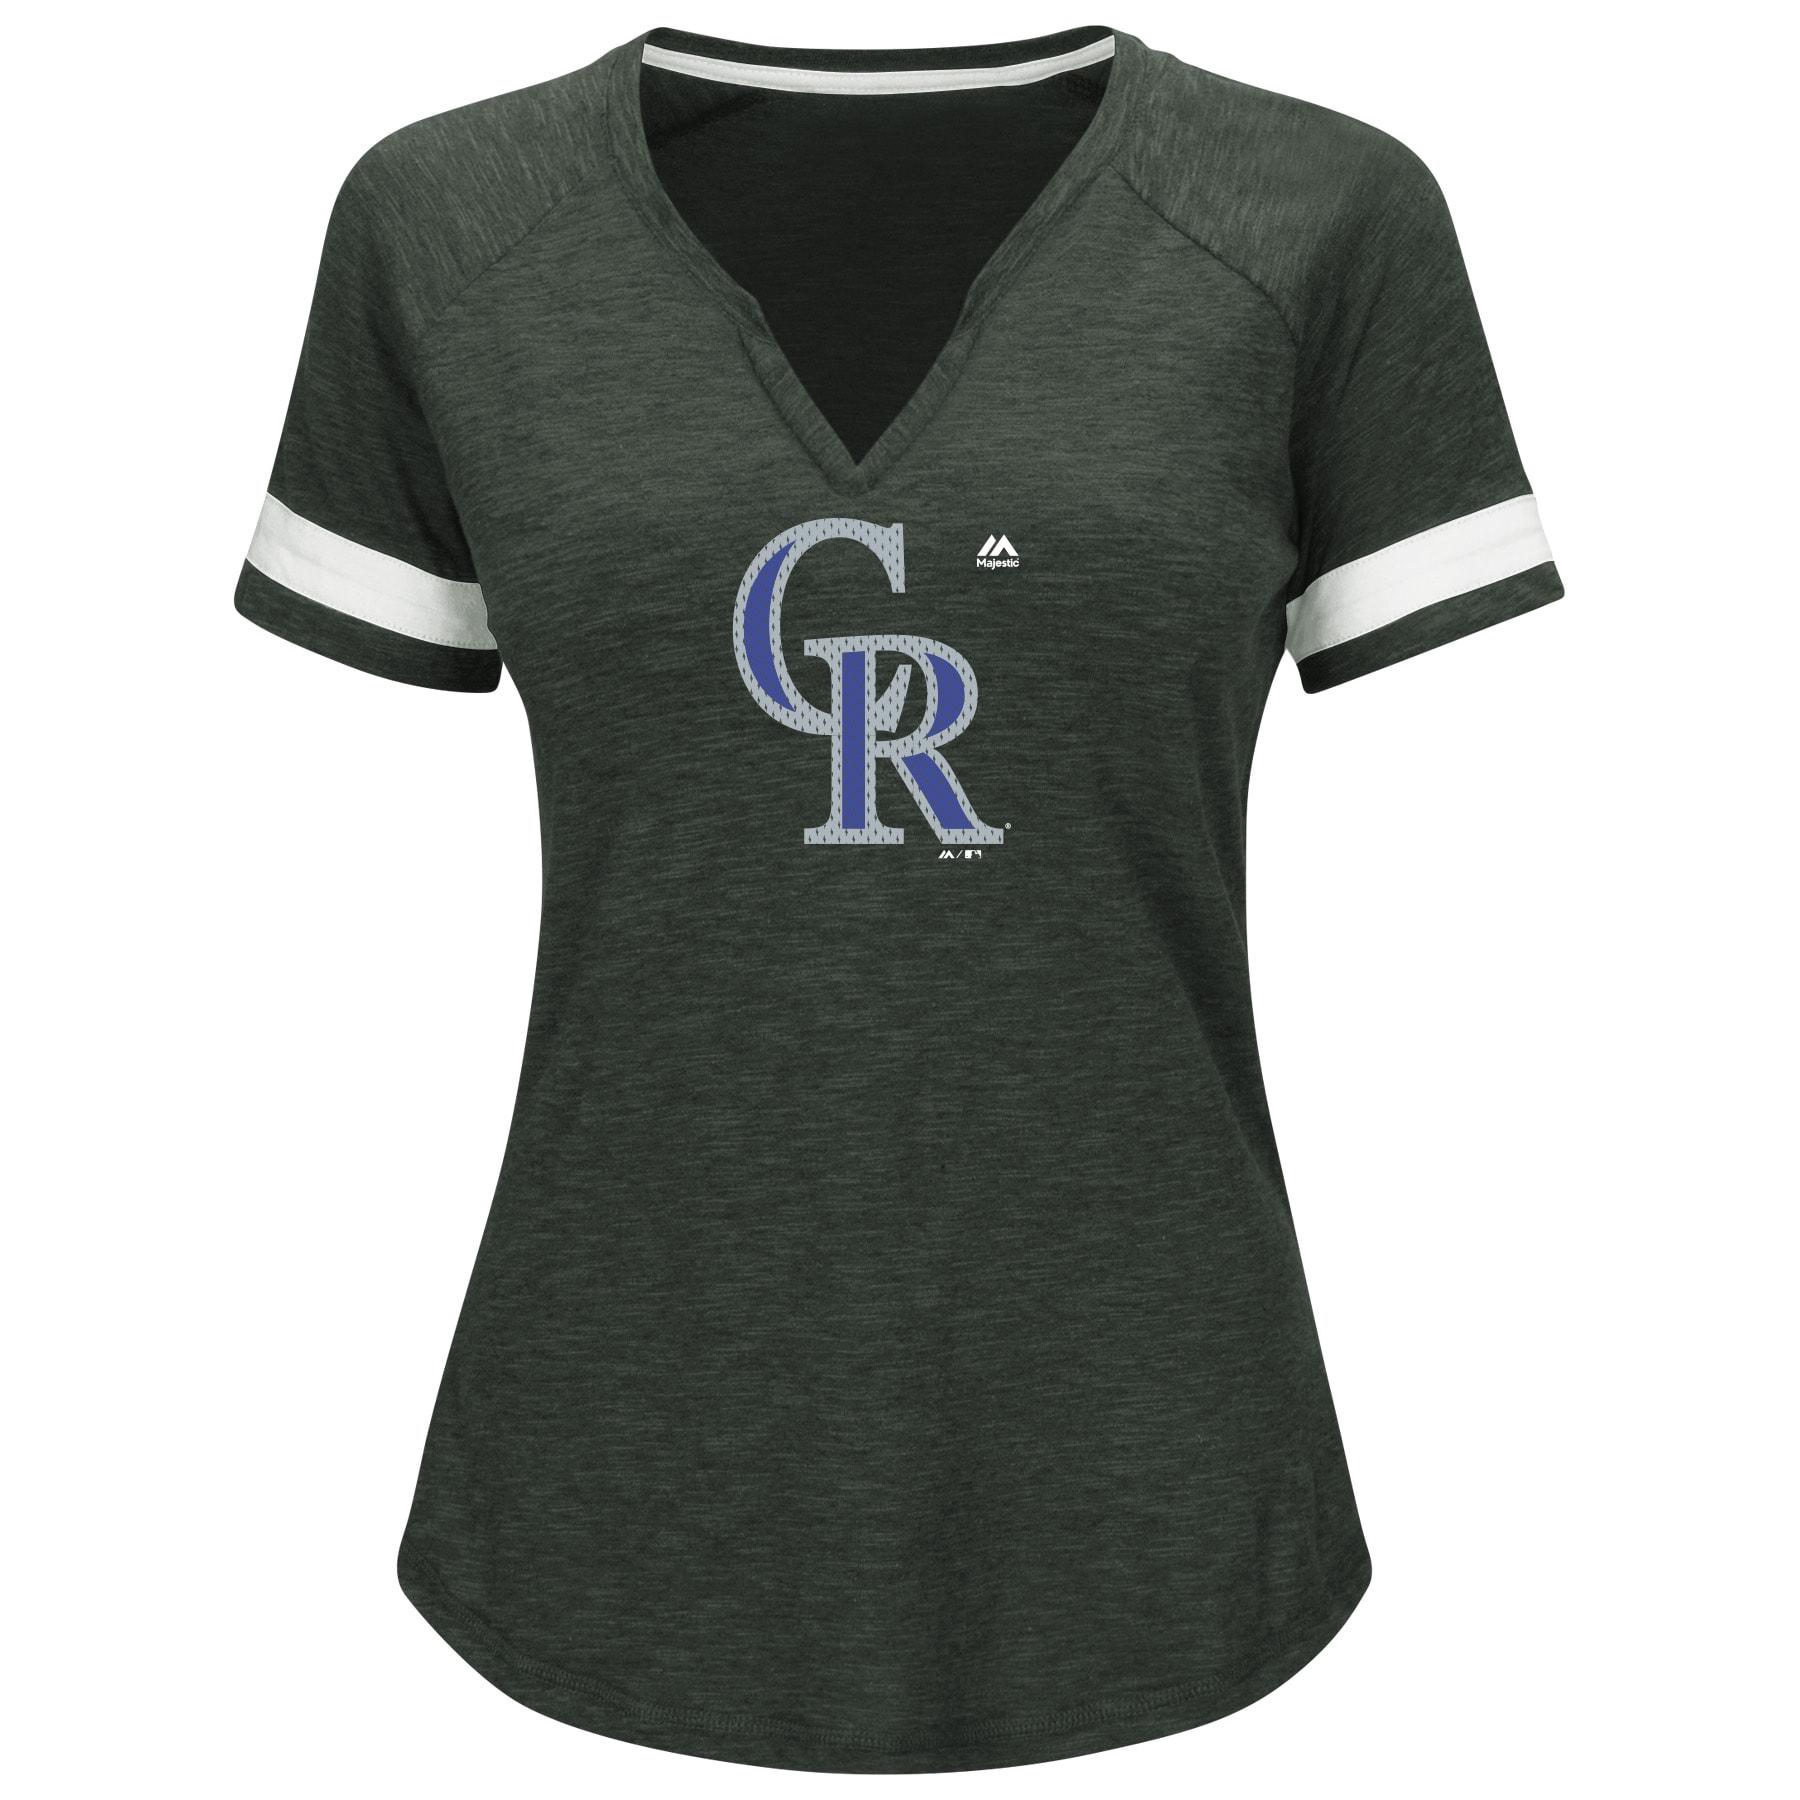 Colorado Rockies Majestic Women's Game Stopper Raglan T-Shirt - Heathered Charcoal